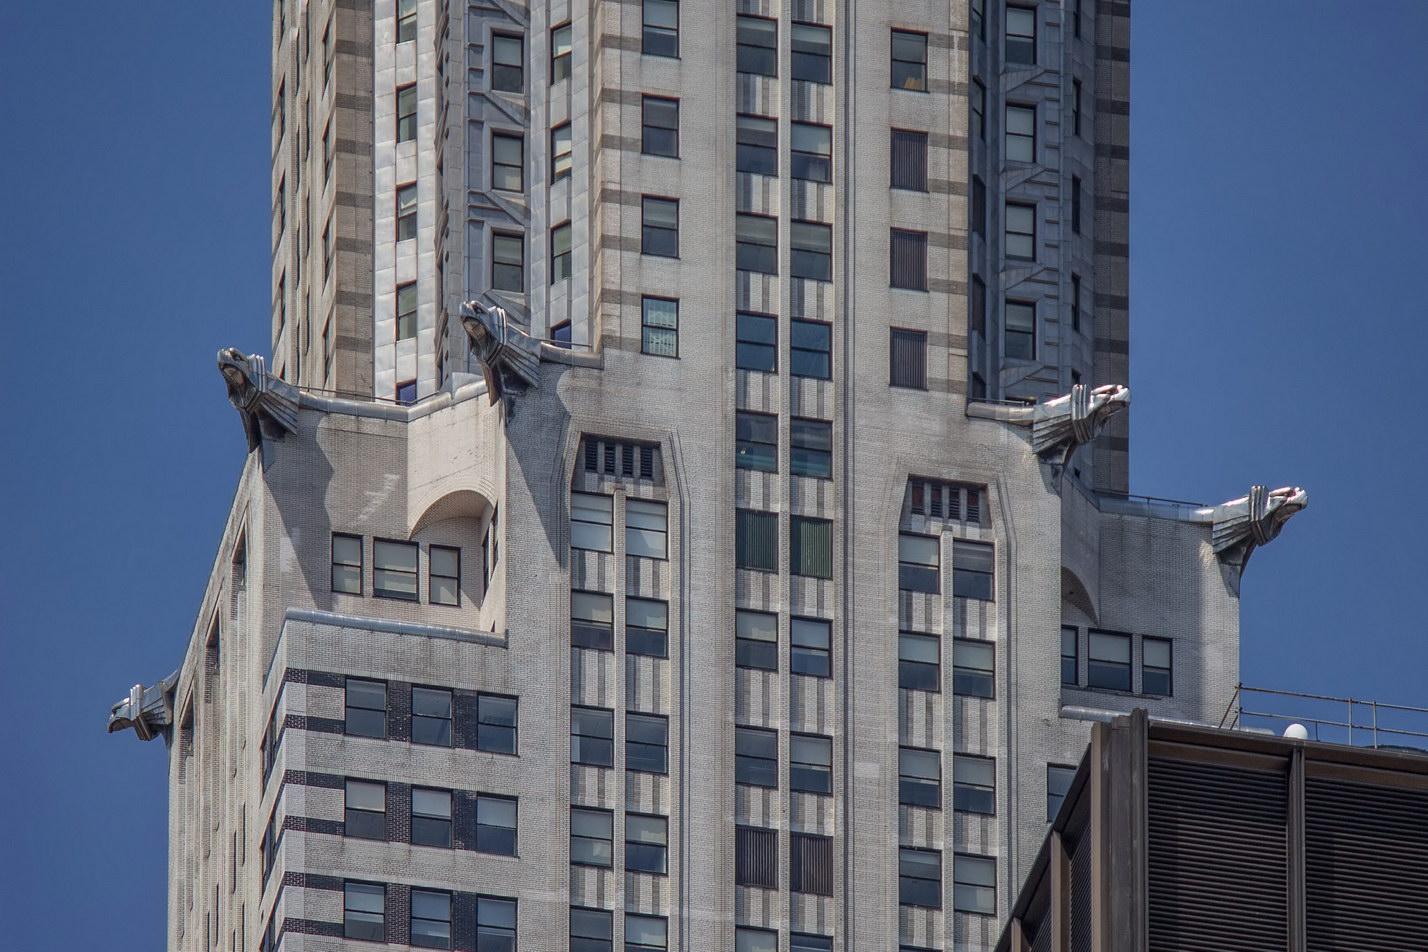 [Chrysler Building] IMG_09141 [8/26/2012 1:02:48 PM]